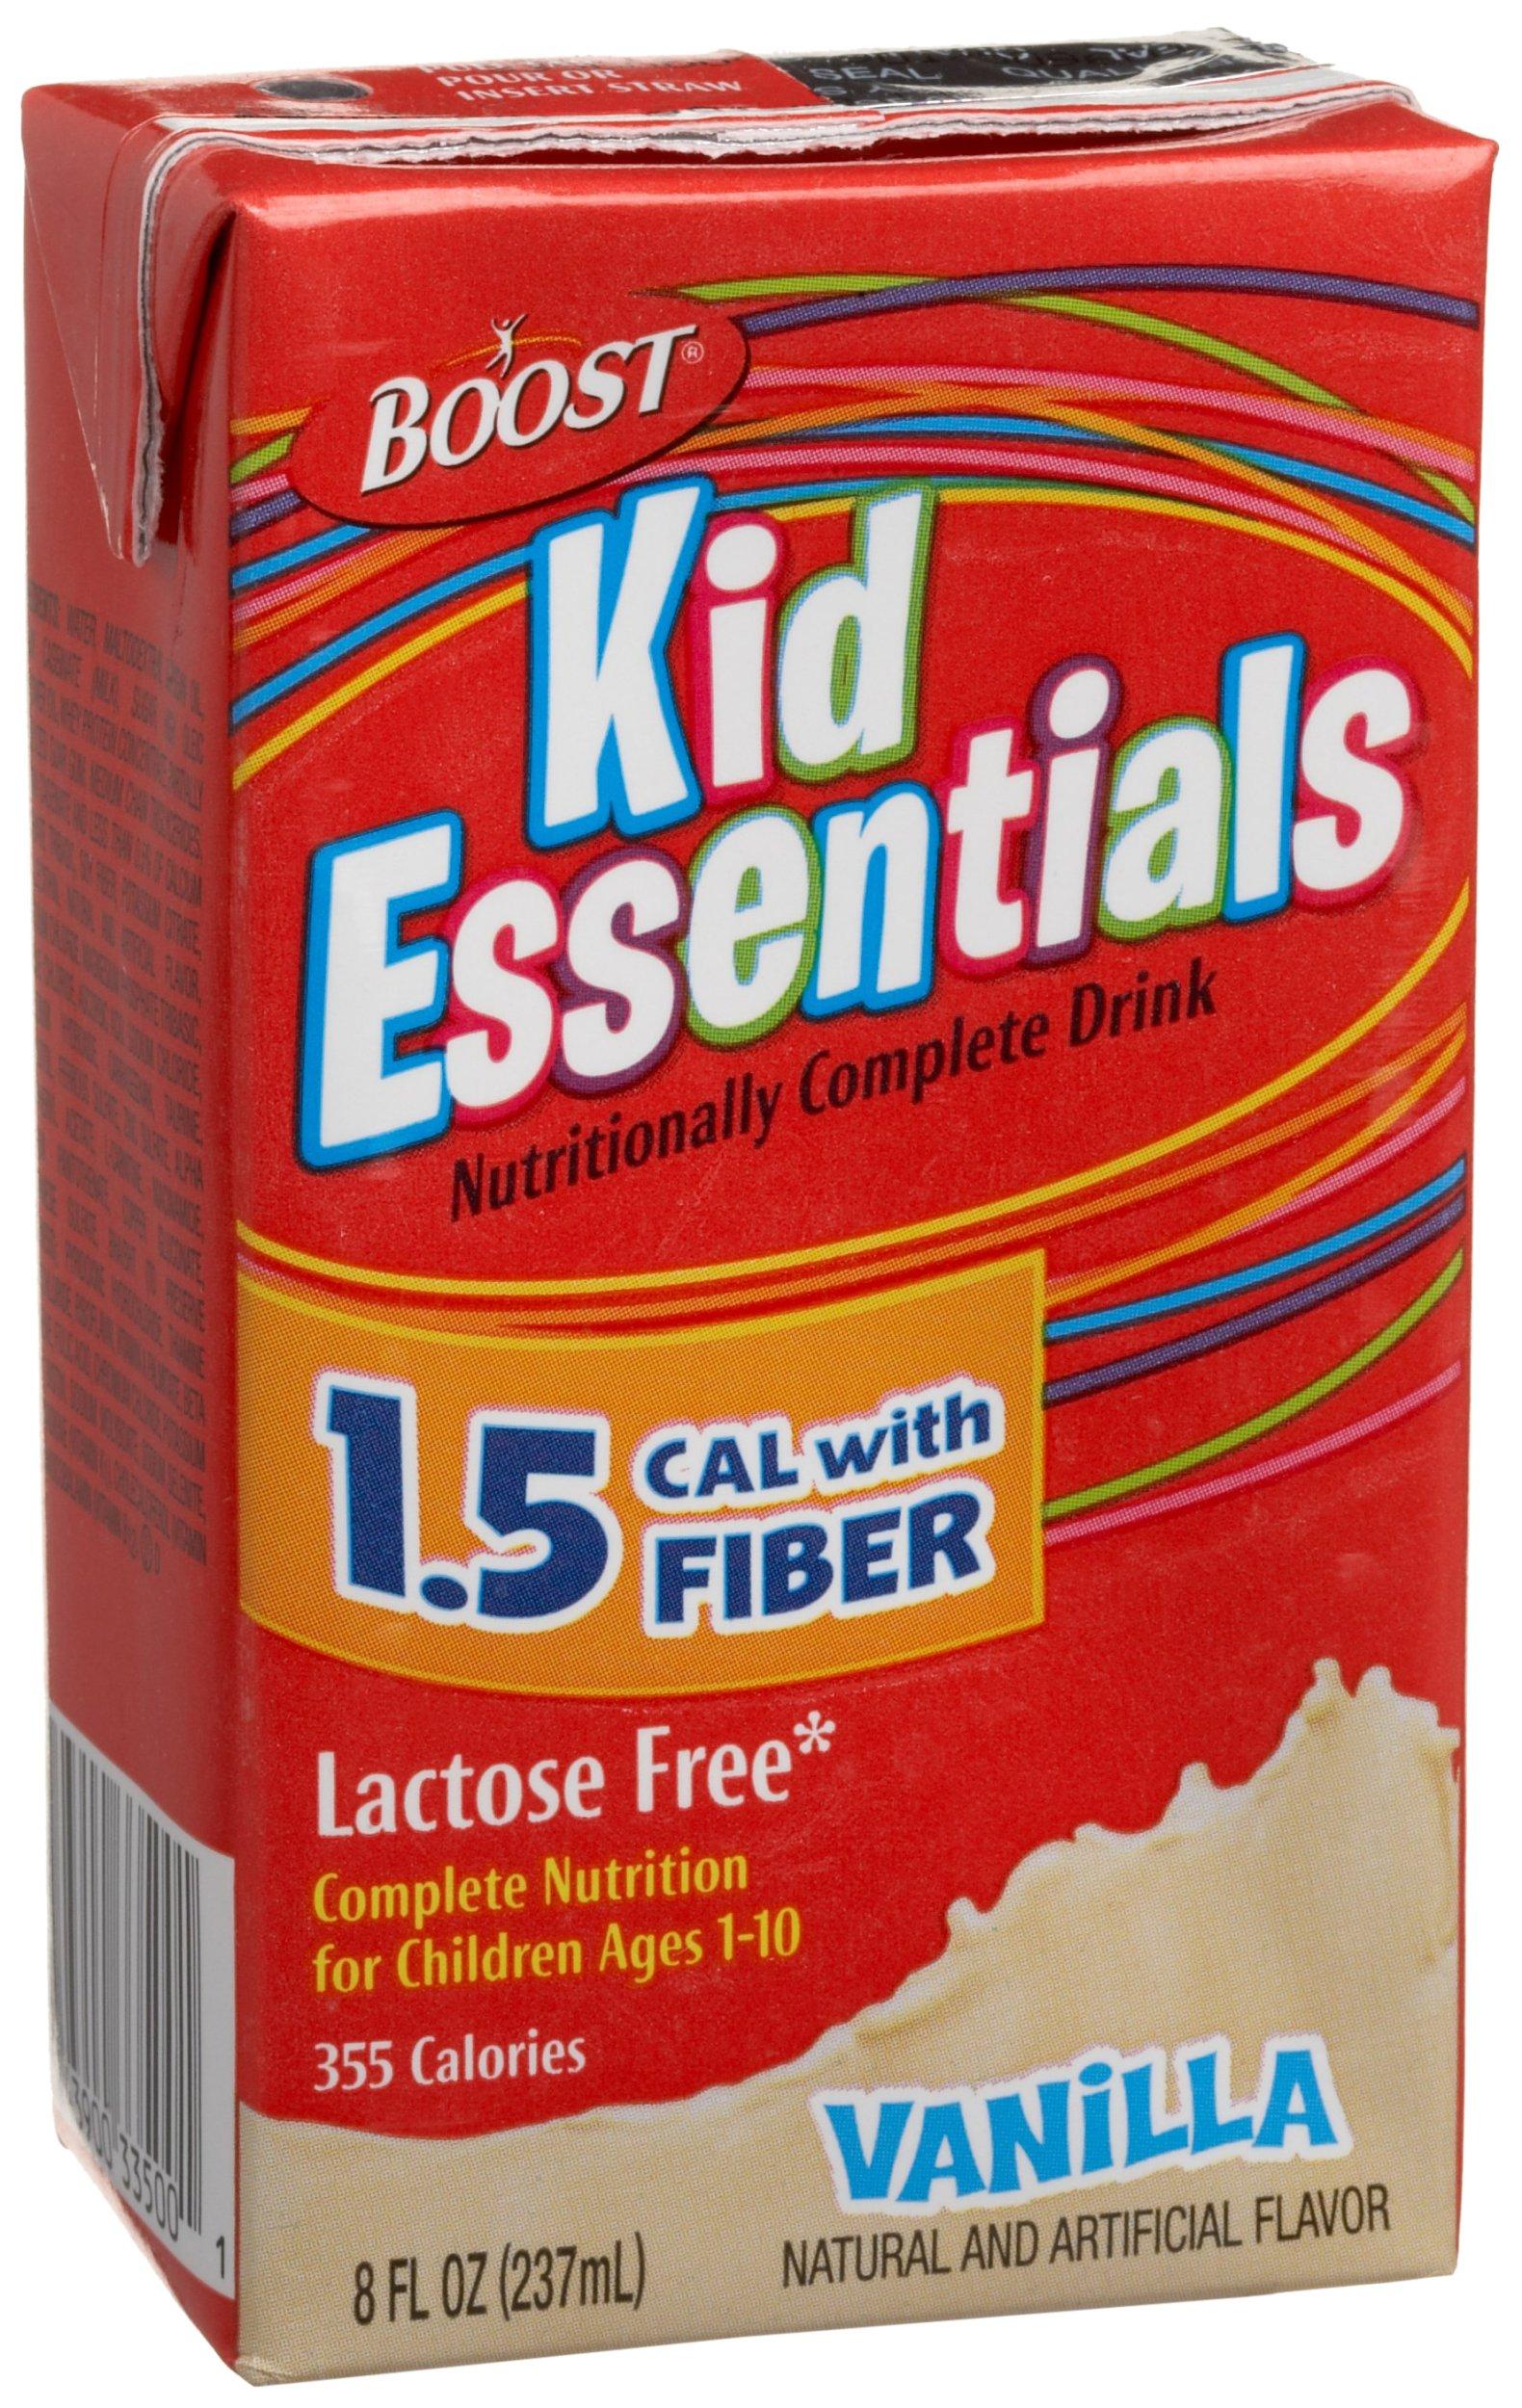 Boost Kid Essentials 1.5 Nutritionally Complete Drink, Vanilla Vortex, 8 Ounce, Pack of 27 by Boost Kids Essentials (Image #2)